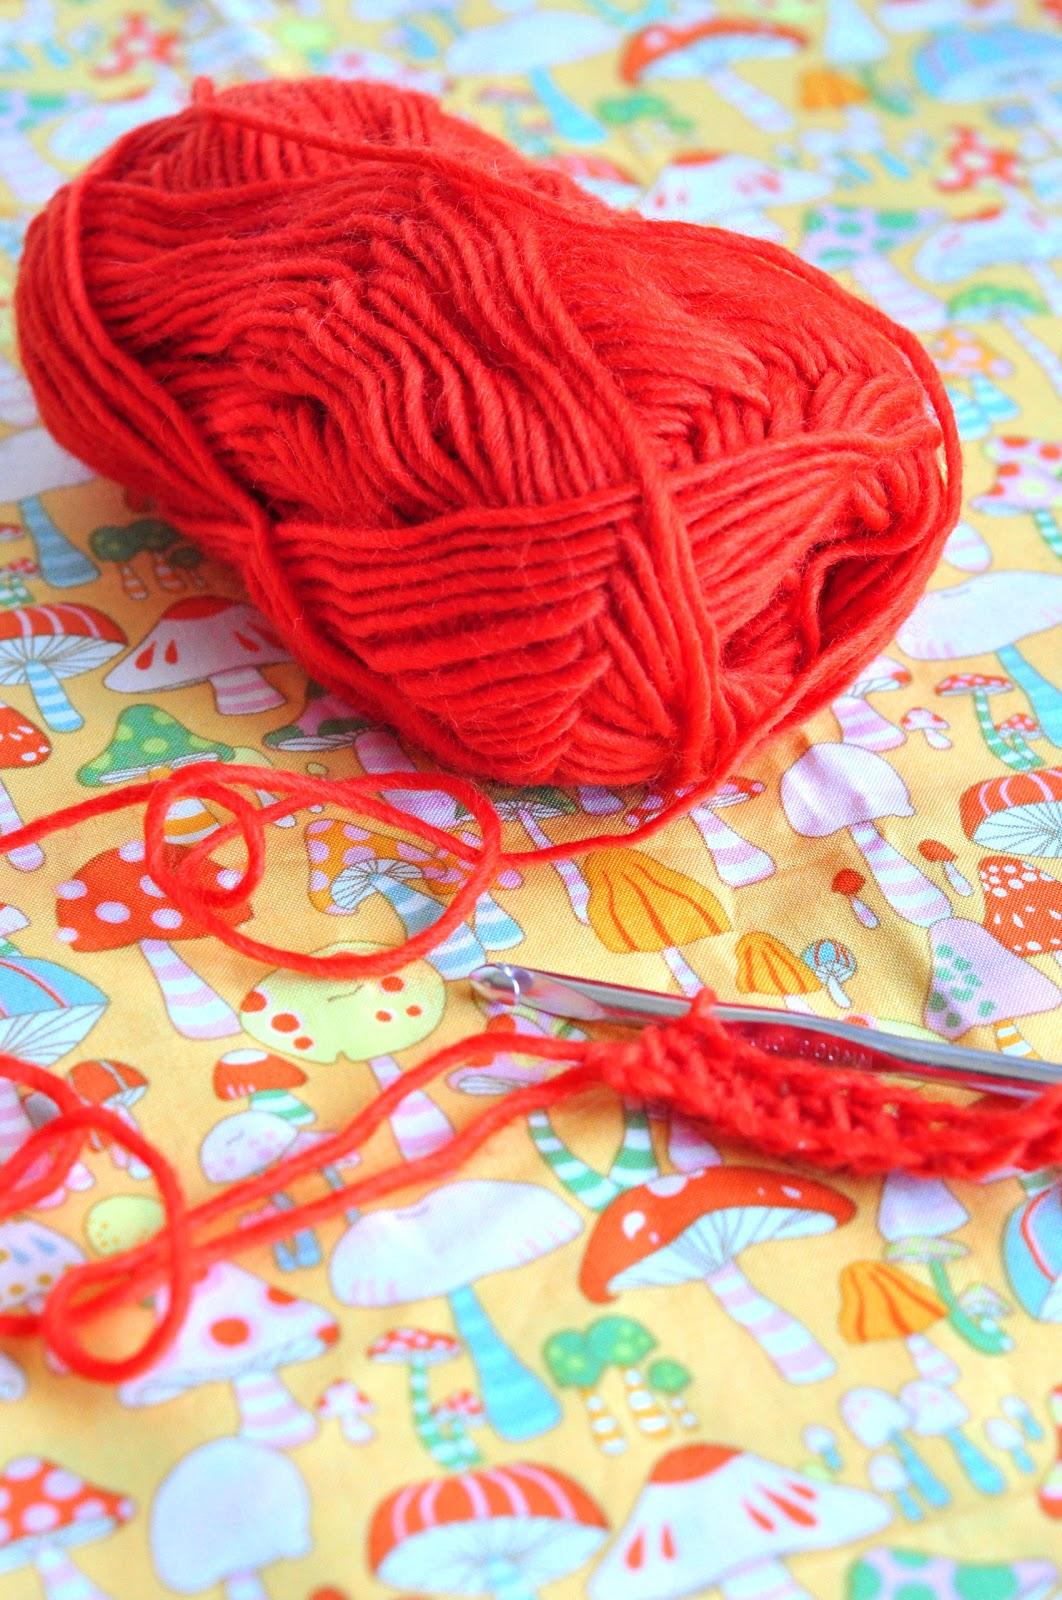 Aesthetic Nest: How to Crochet 8: The Half Double Crochet (Tutorial)